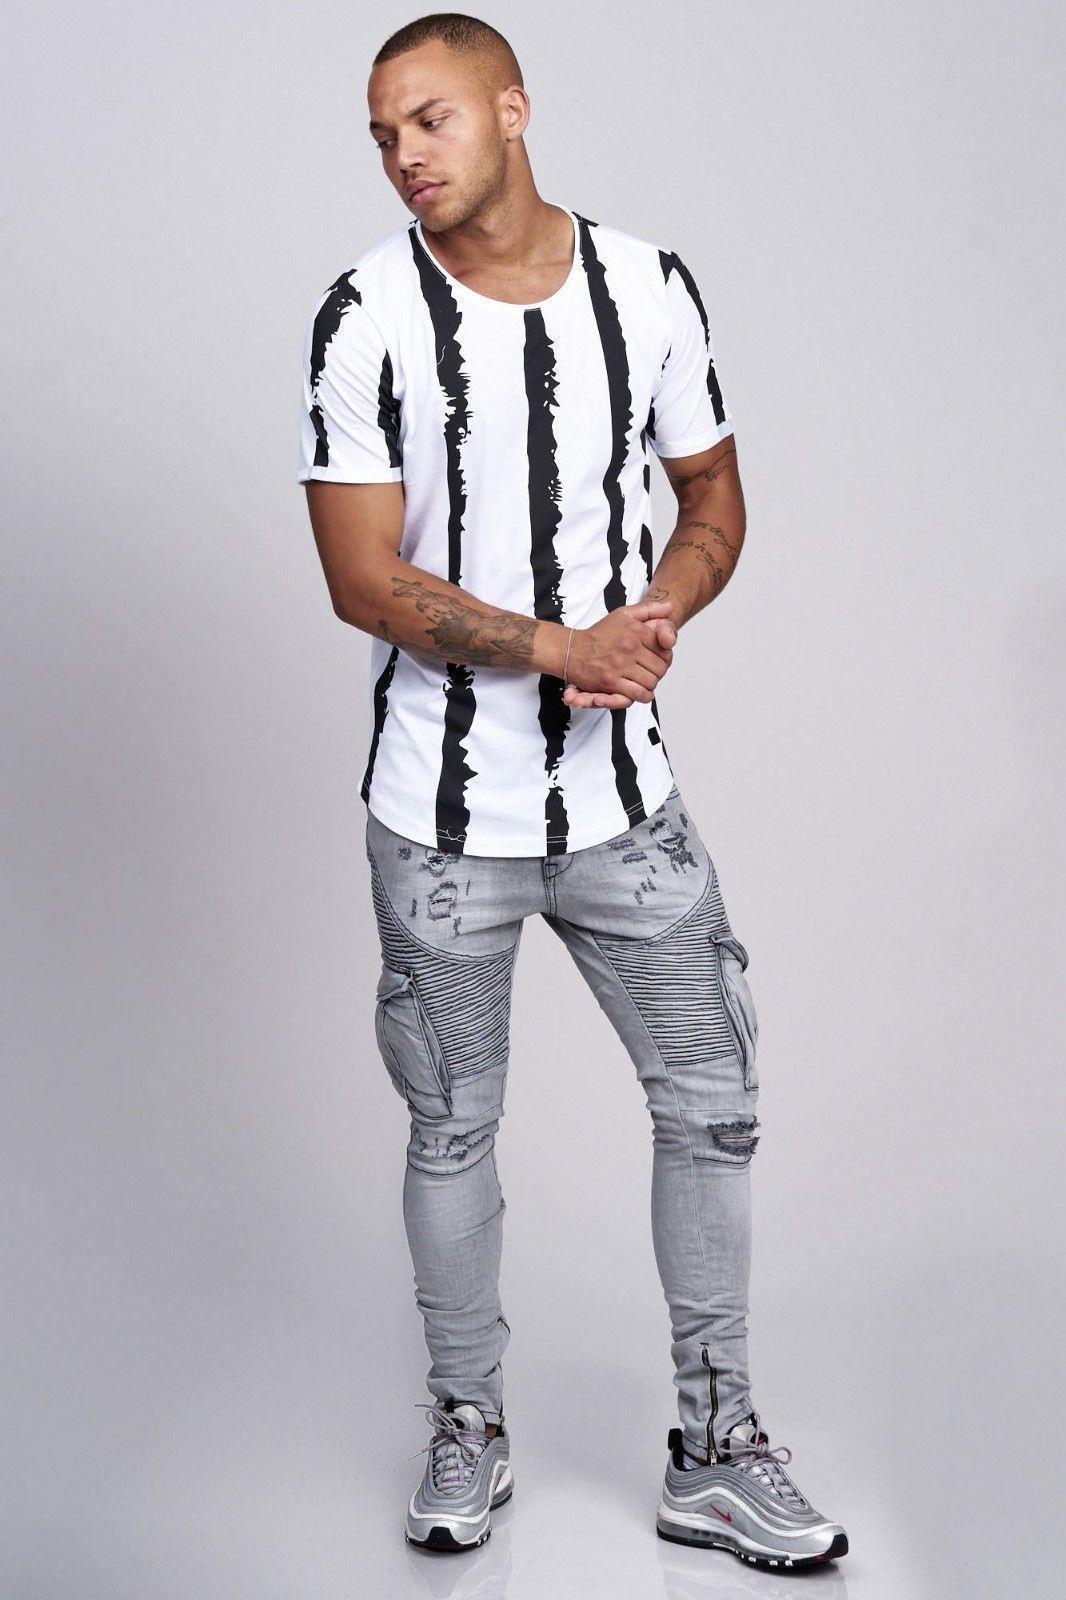 T-shirt-da-Uomo-Polo-Shirt-a-Maniche-Corte-printshirt-Polo-a-Maniche-Corte-17018-John-Kayna miniatura 12